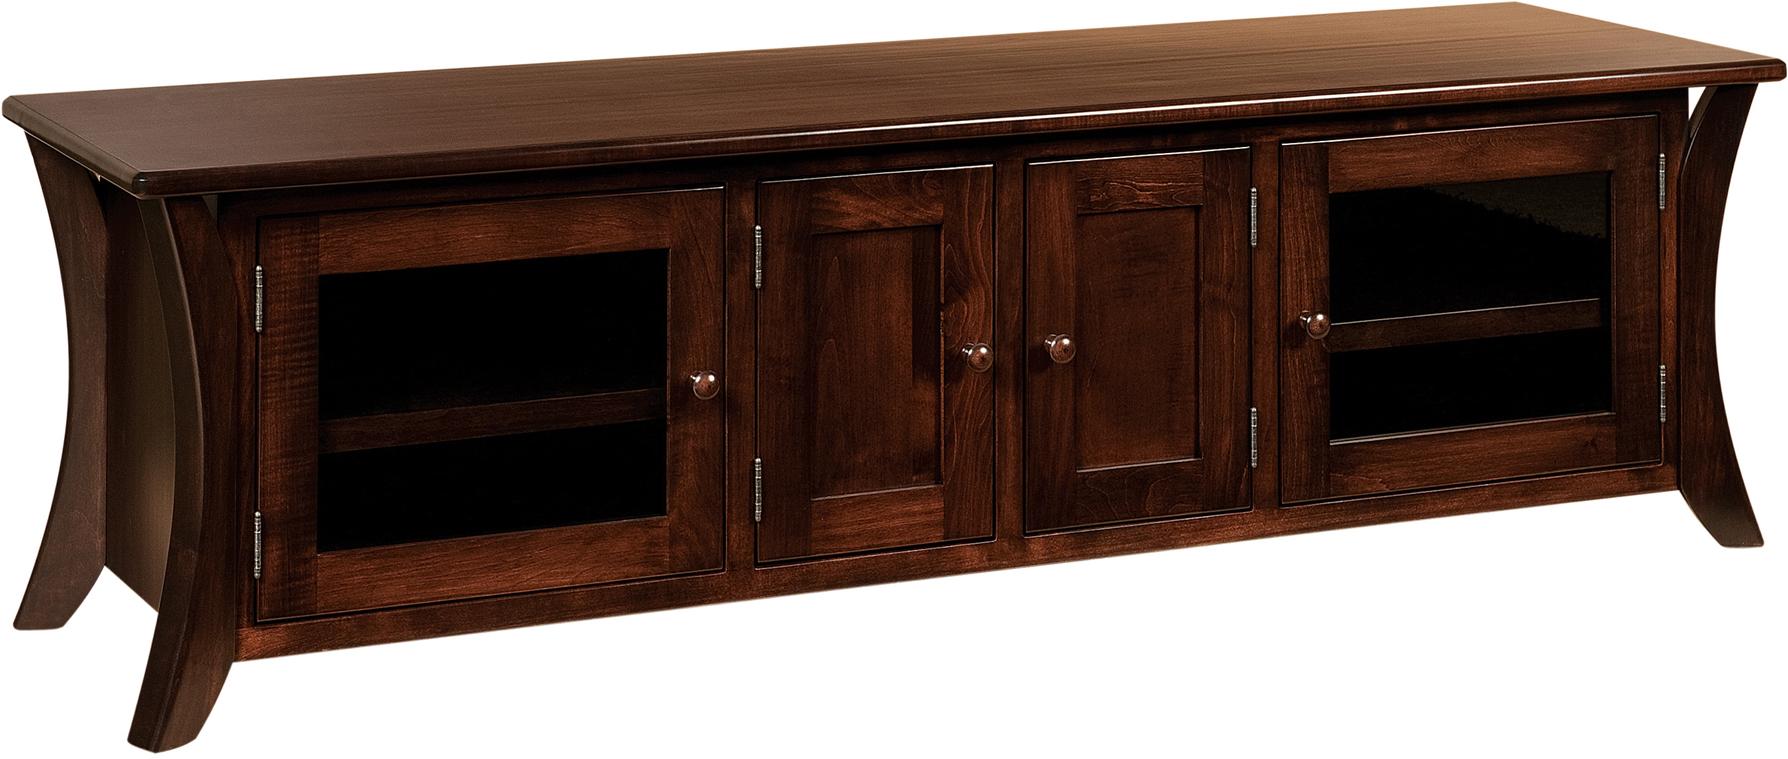 Caledonia Low Tv Cabinets Custom Amish Caledonia Low Tv